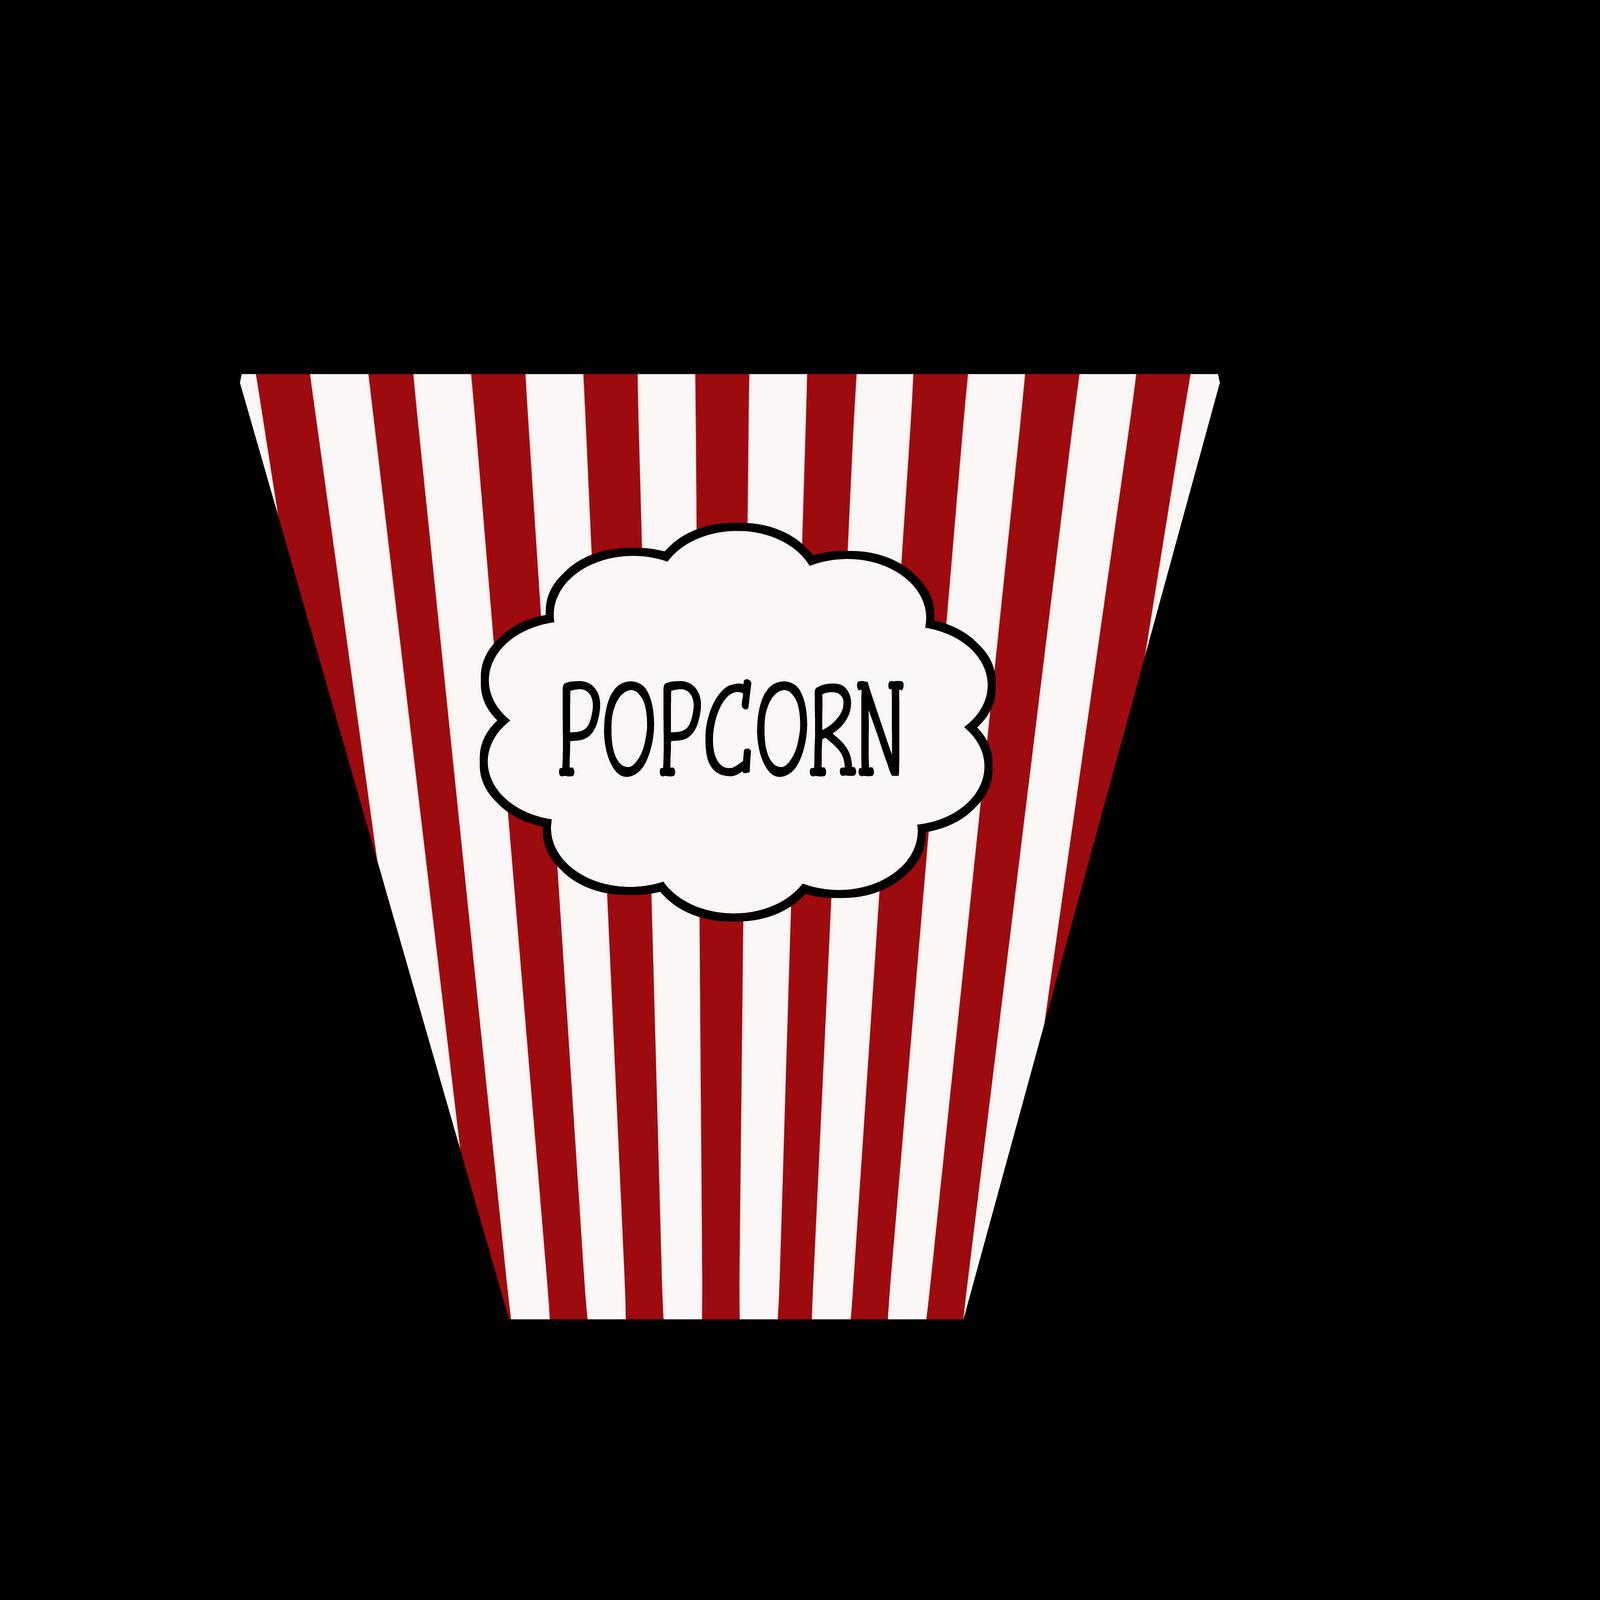 Snack clipart popcorn bucket Clipart Border Clipart Popcorn Free